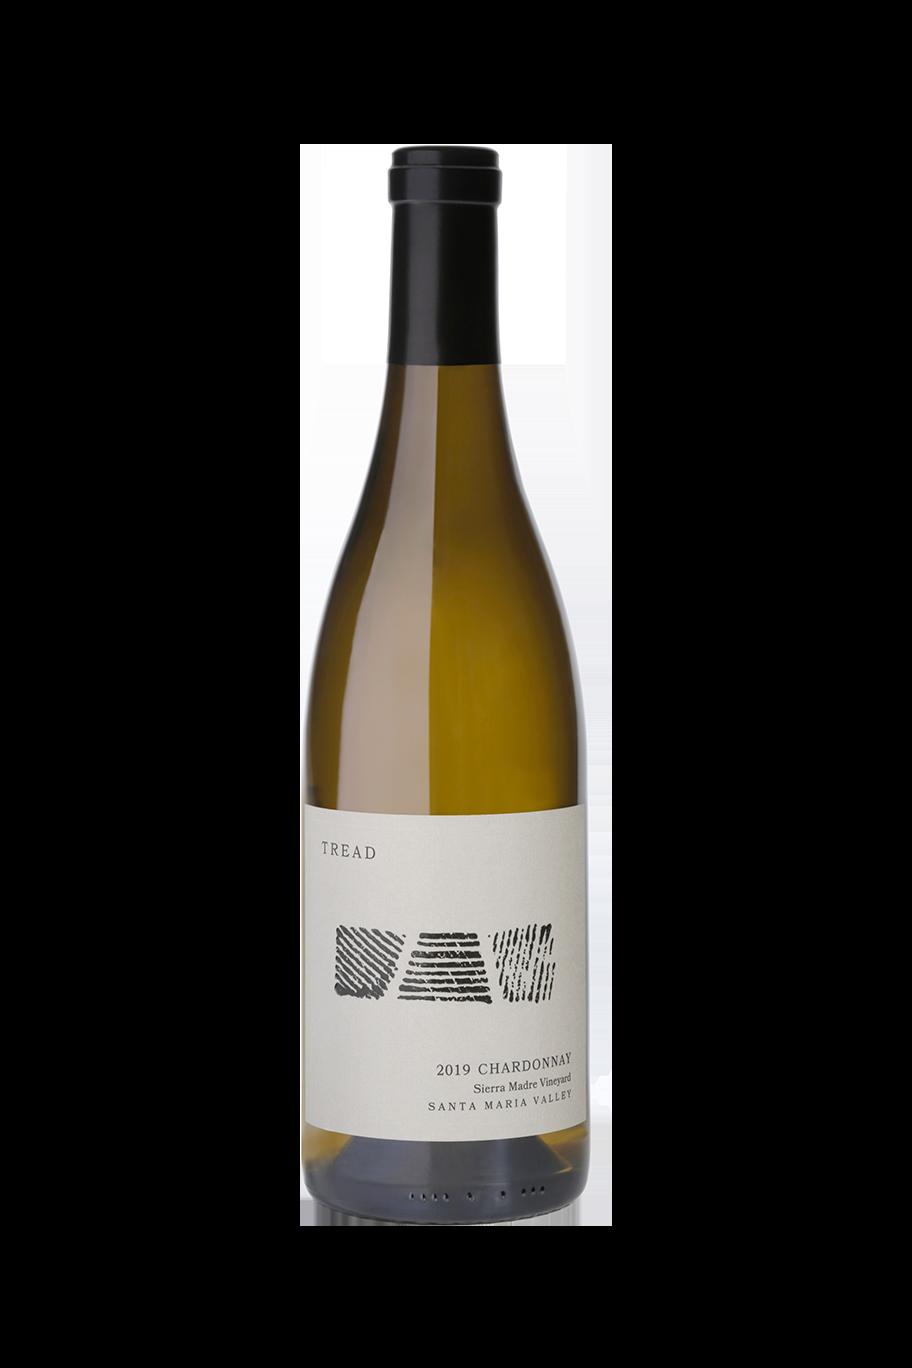 2019 TREAD Santa Maria Valley Chardonnay Bottle Shot